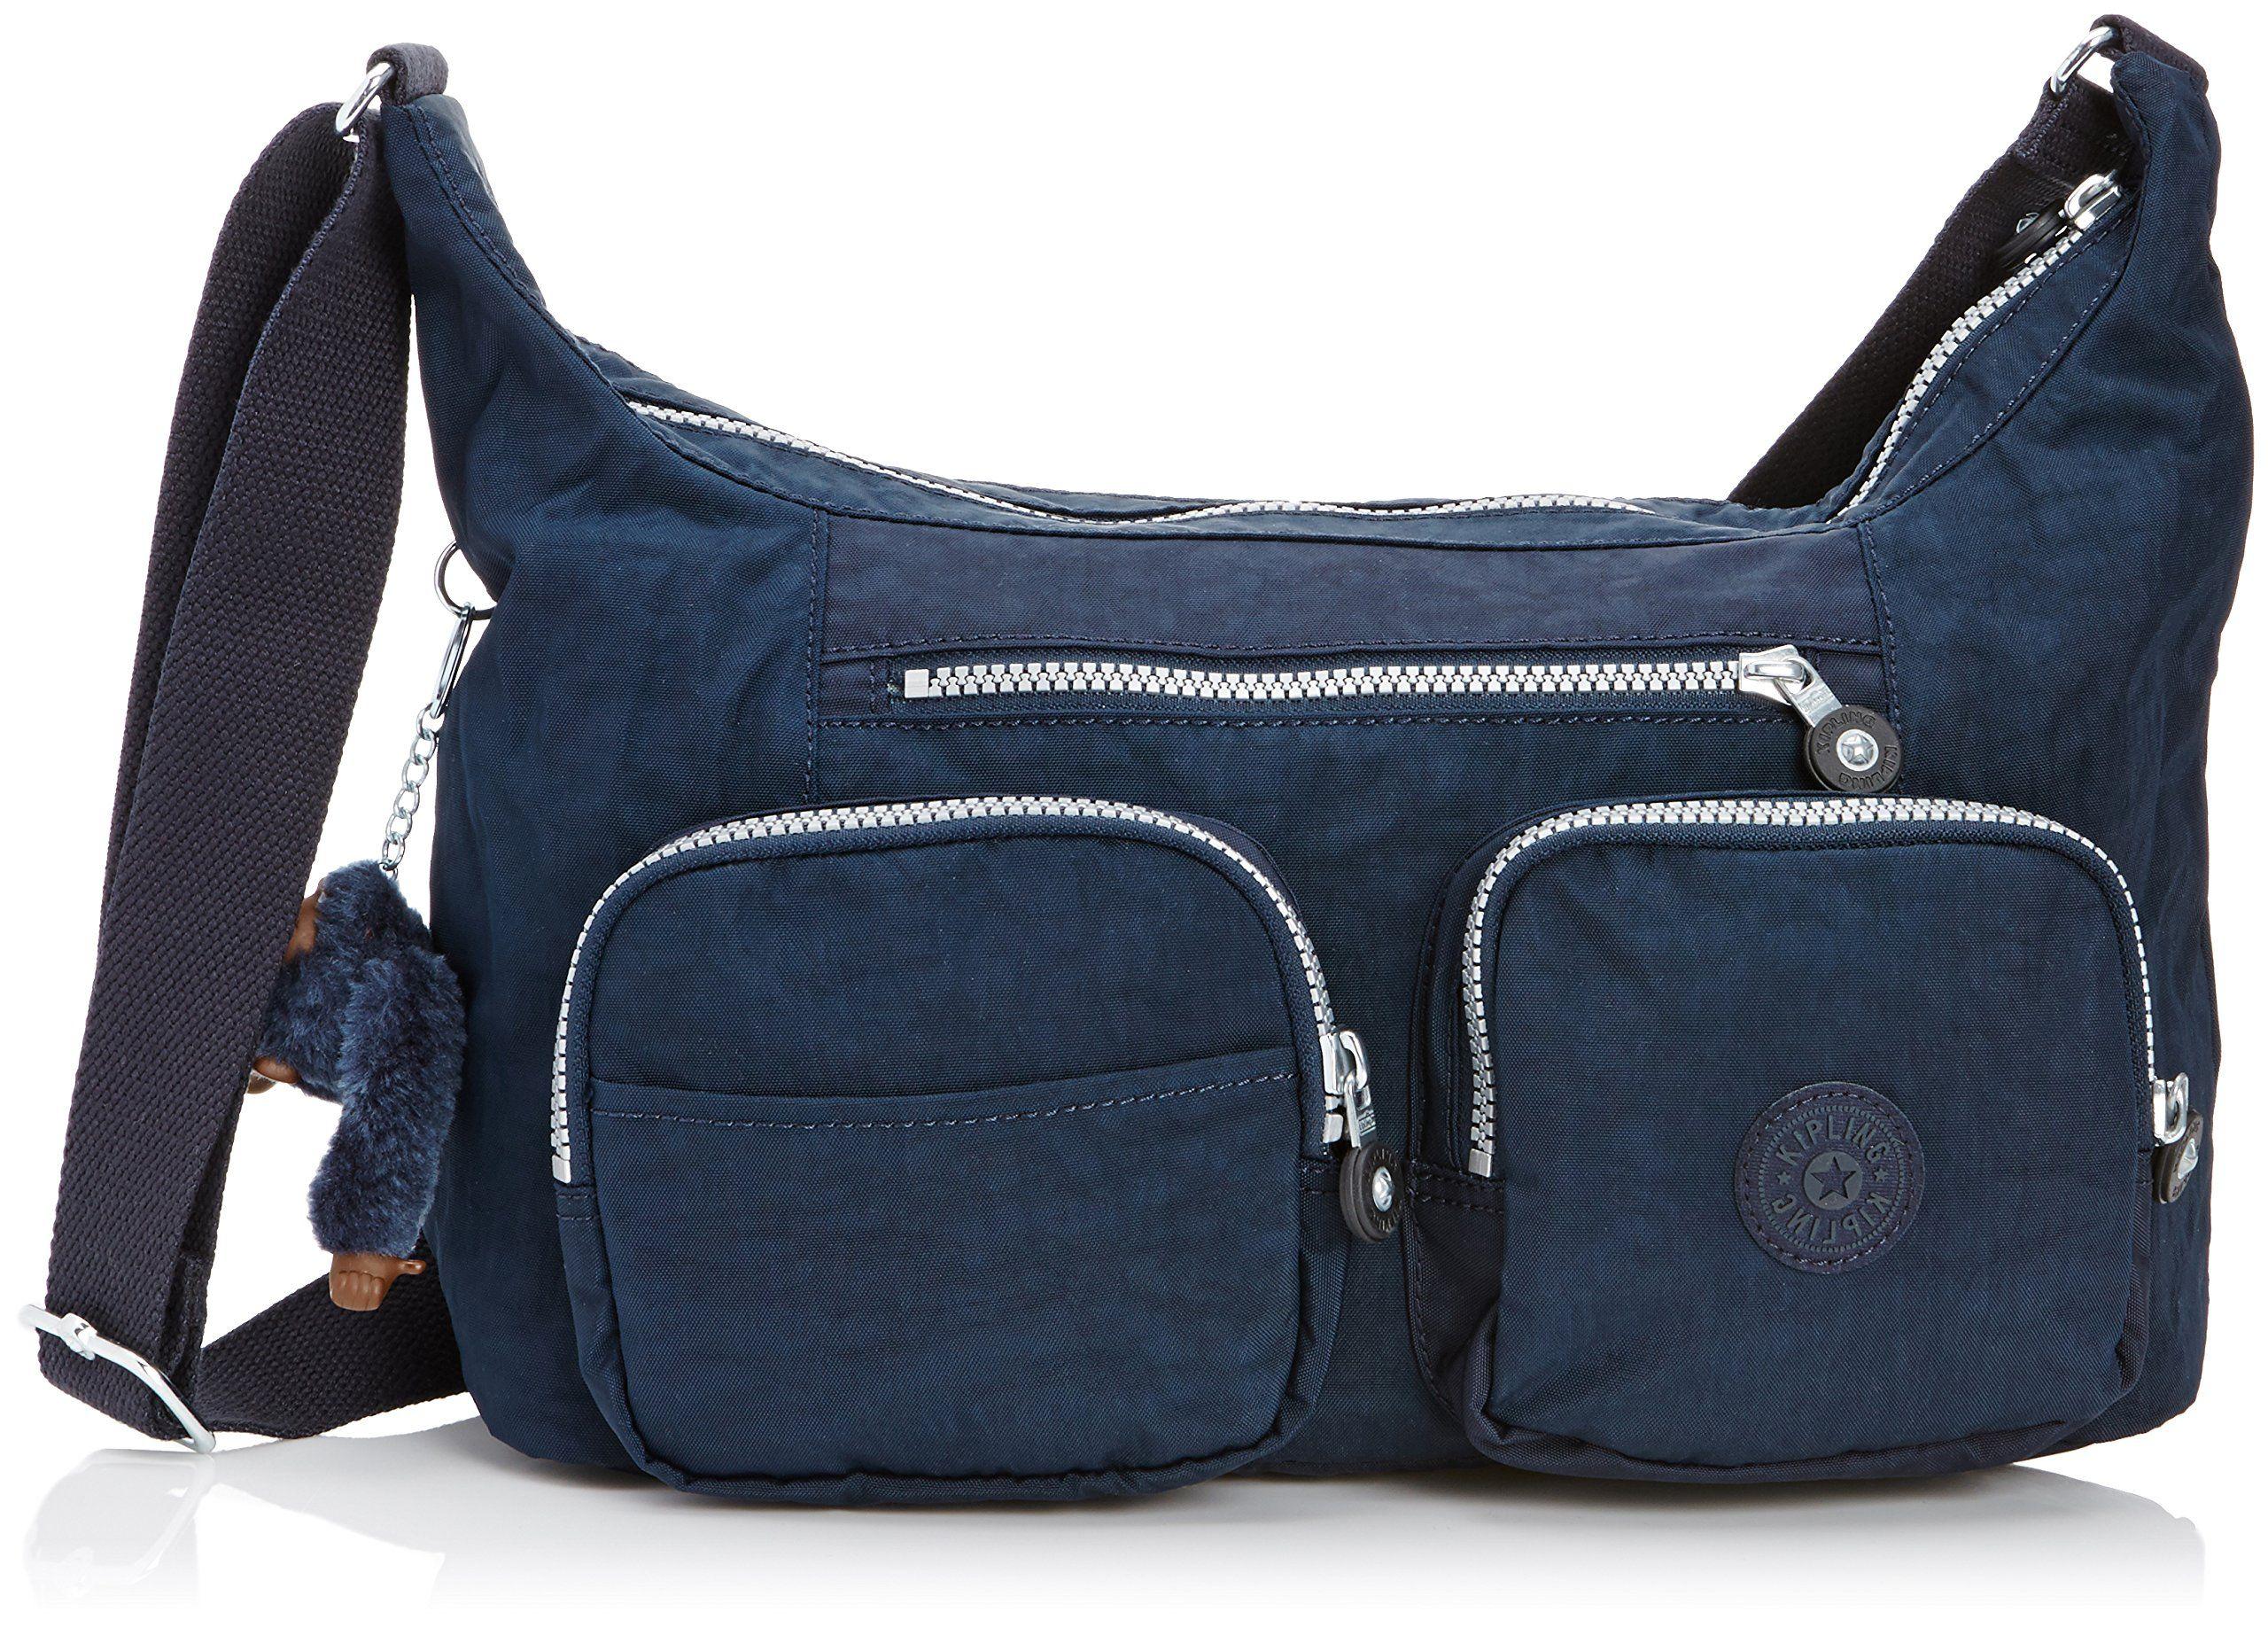 Kipling Women's Jarita Shoulder Bag (Across Body) True